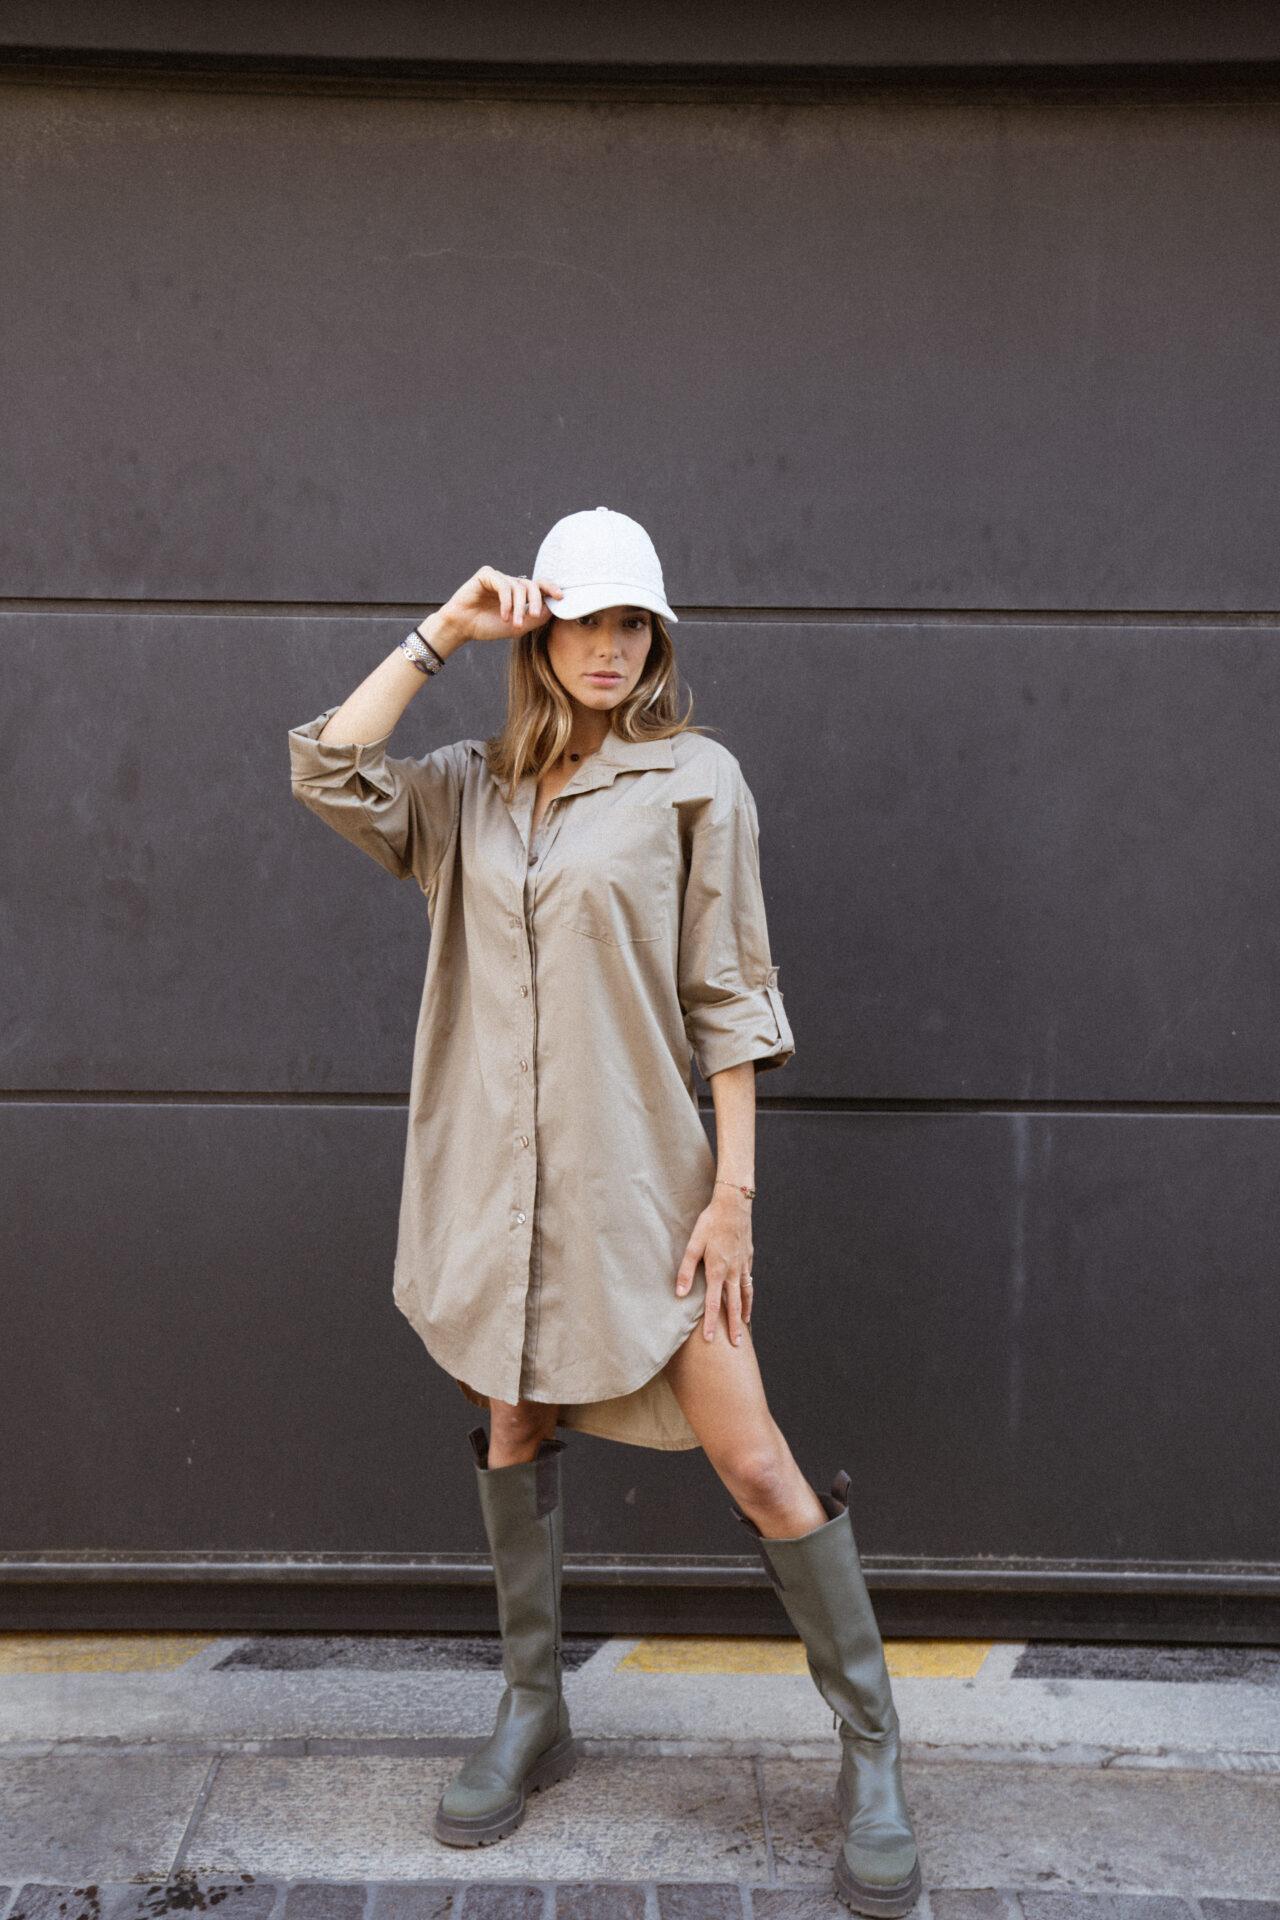 robe-chemise-beige-botte-de-pluie-casquette-femme-gisette-store (11)